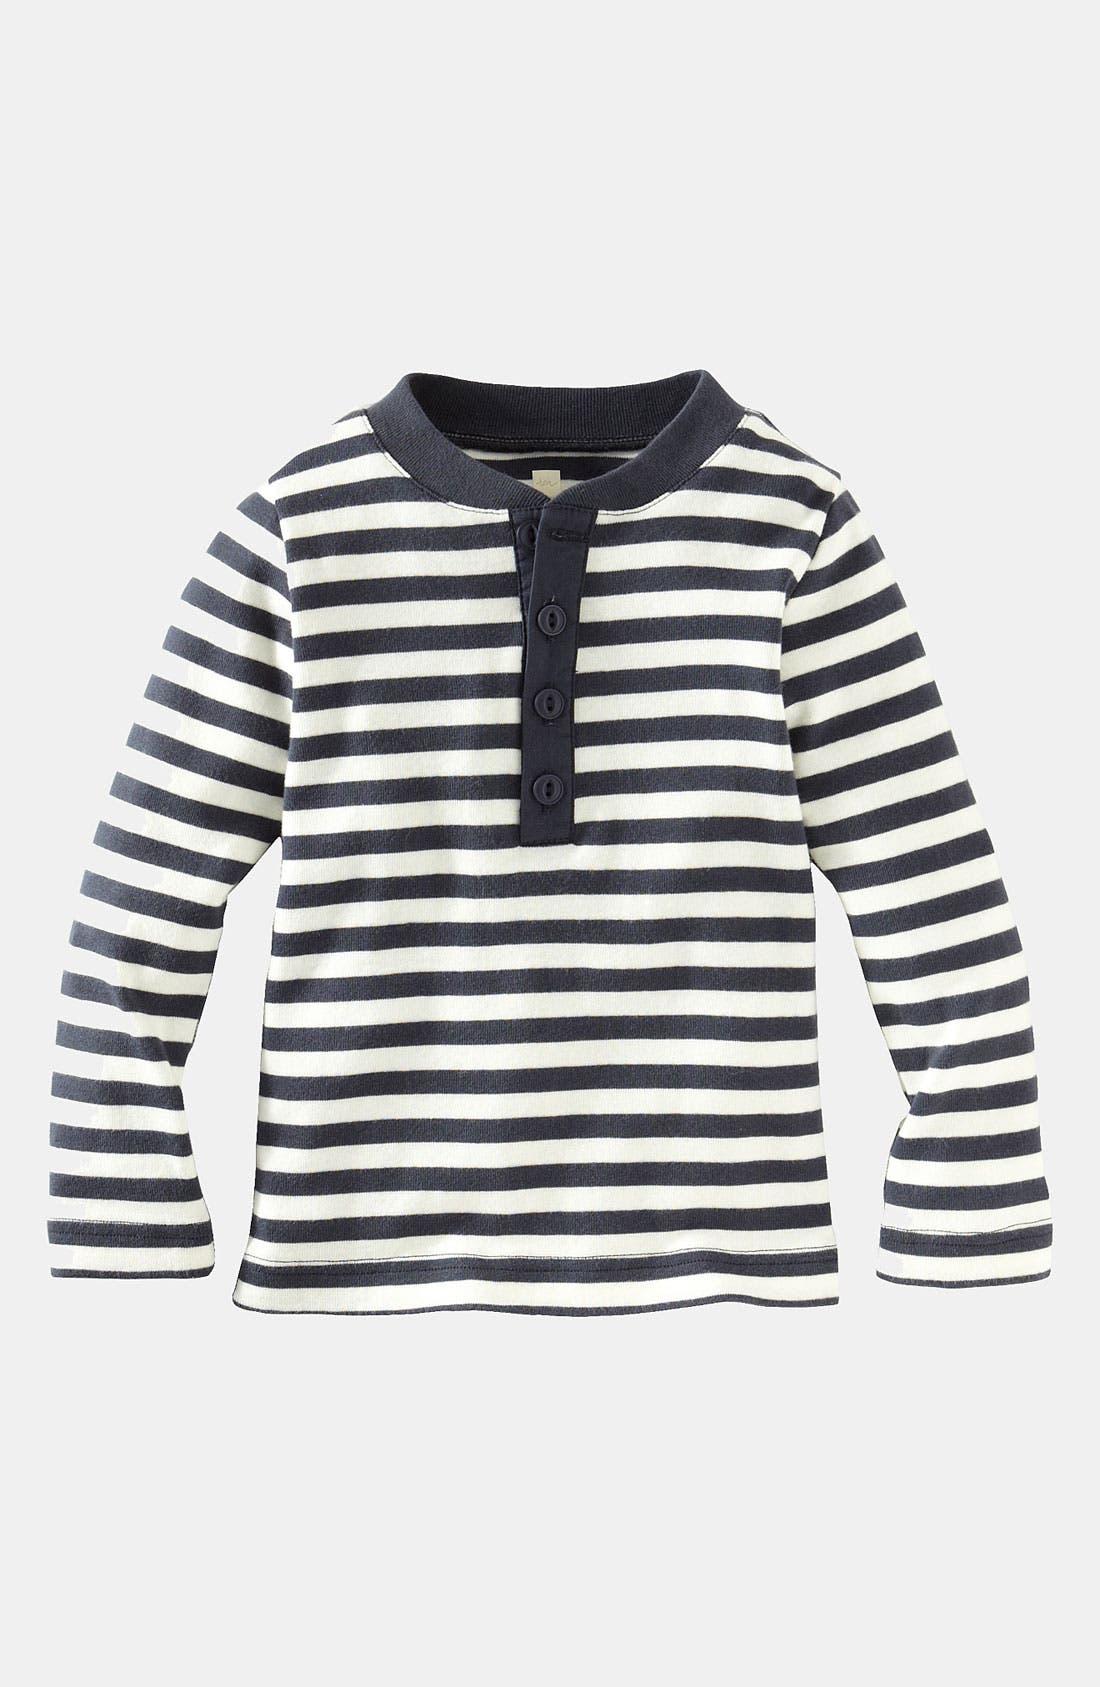 Alternate Image 1 Selected - Tea Collection Henley Shirt (Toddler)